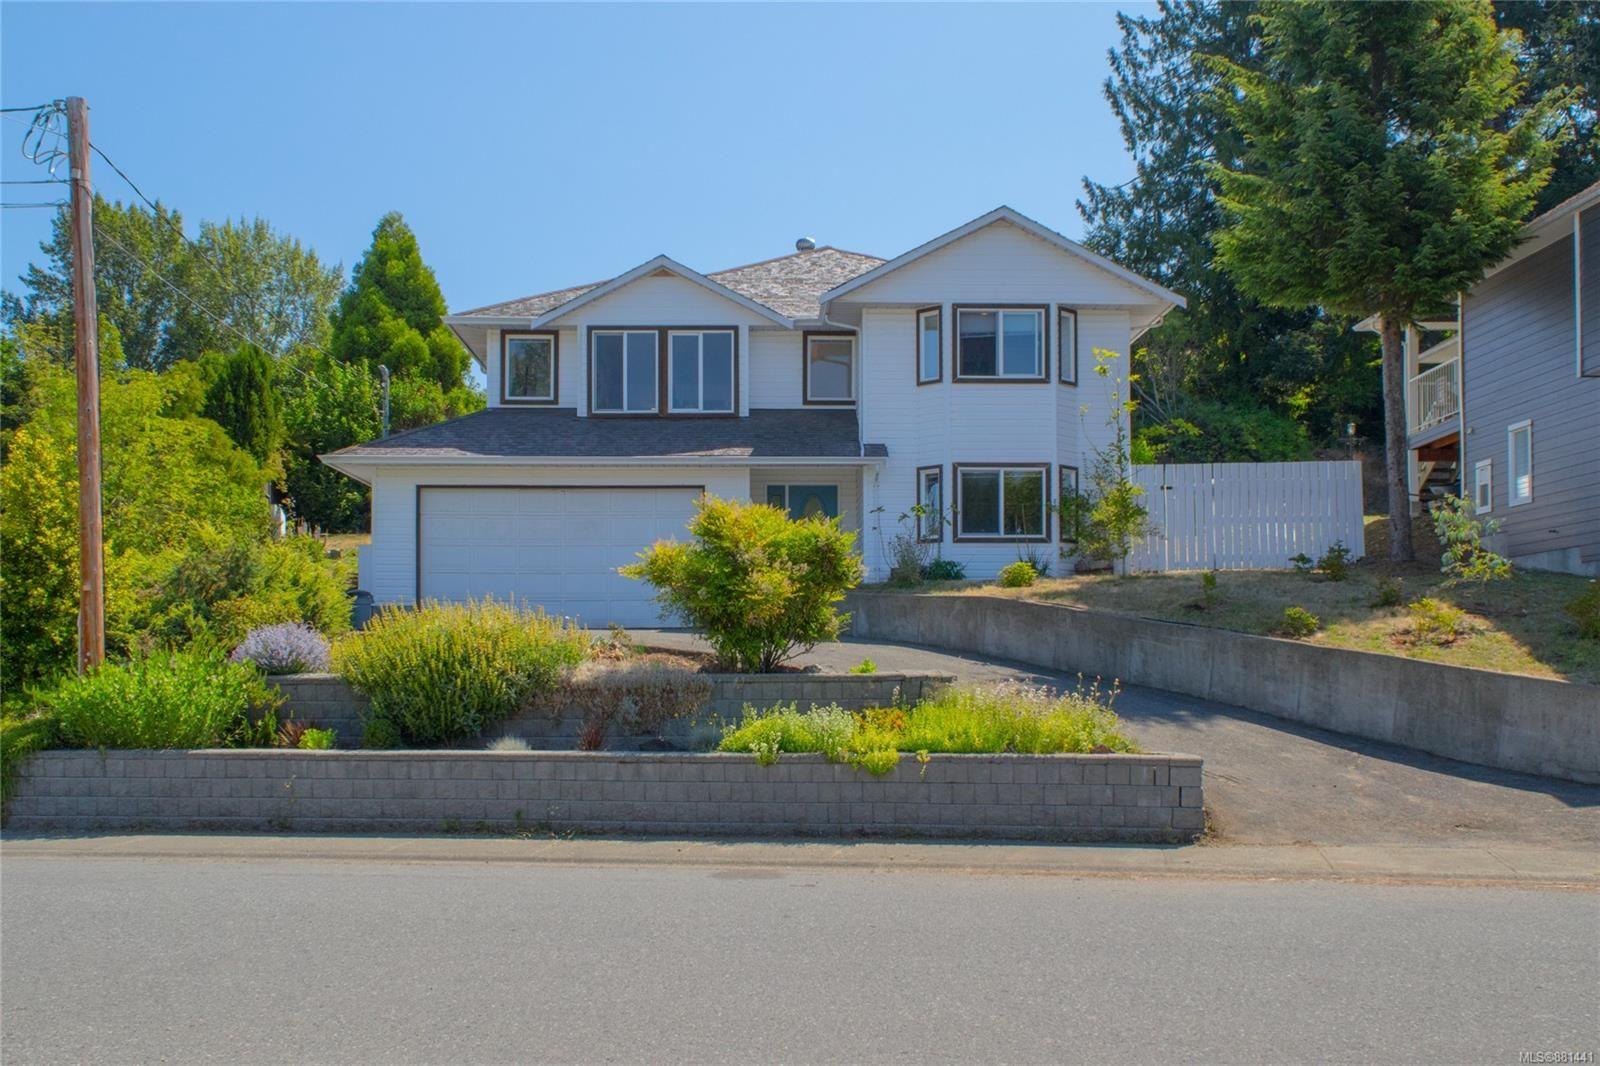 Main Photo: 6211 Fairview Way in Duncan: Du West Duncan House for sale : MLS®# 881441